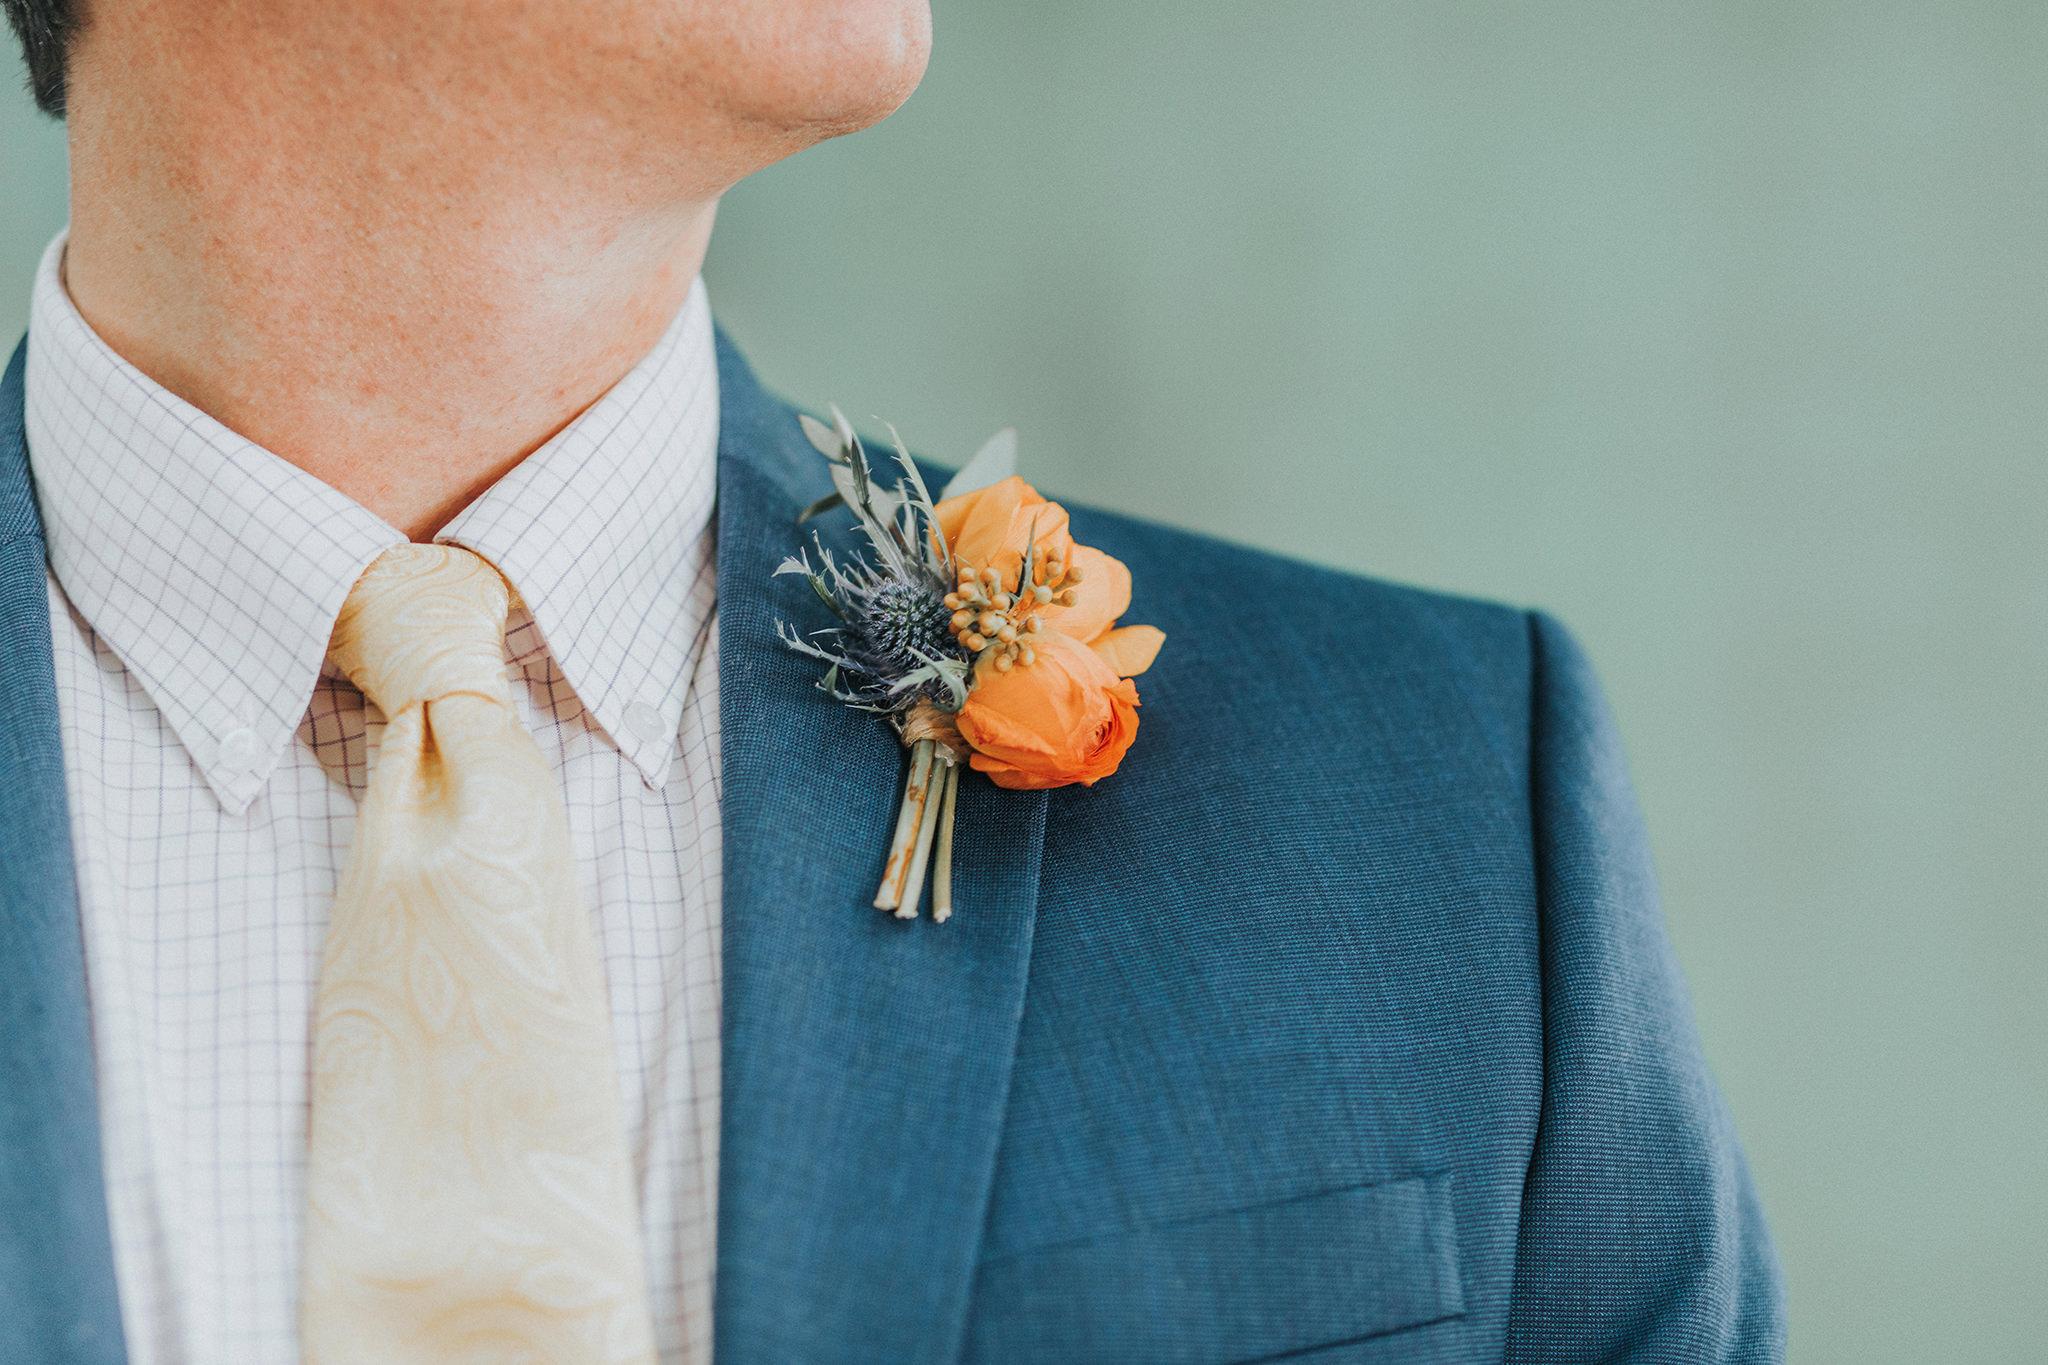 125 omaha-wedding-photographer-planner-tiny-luxe-velvet-sage.jpg